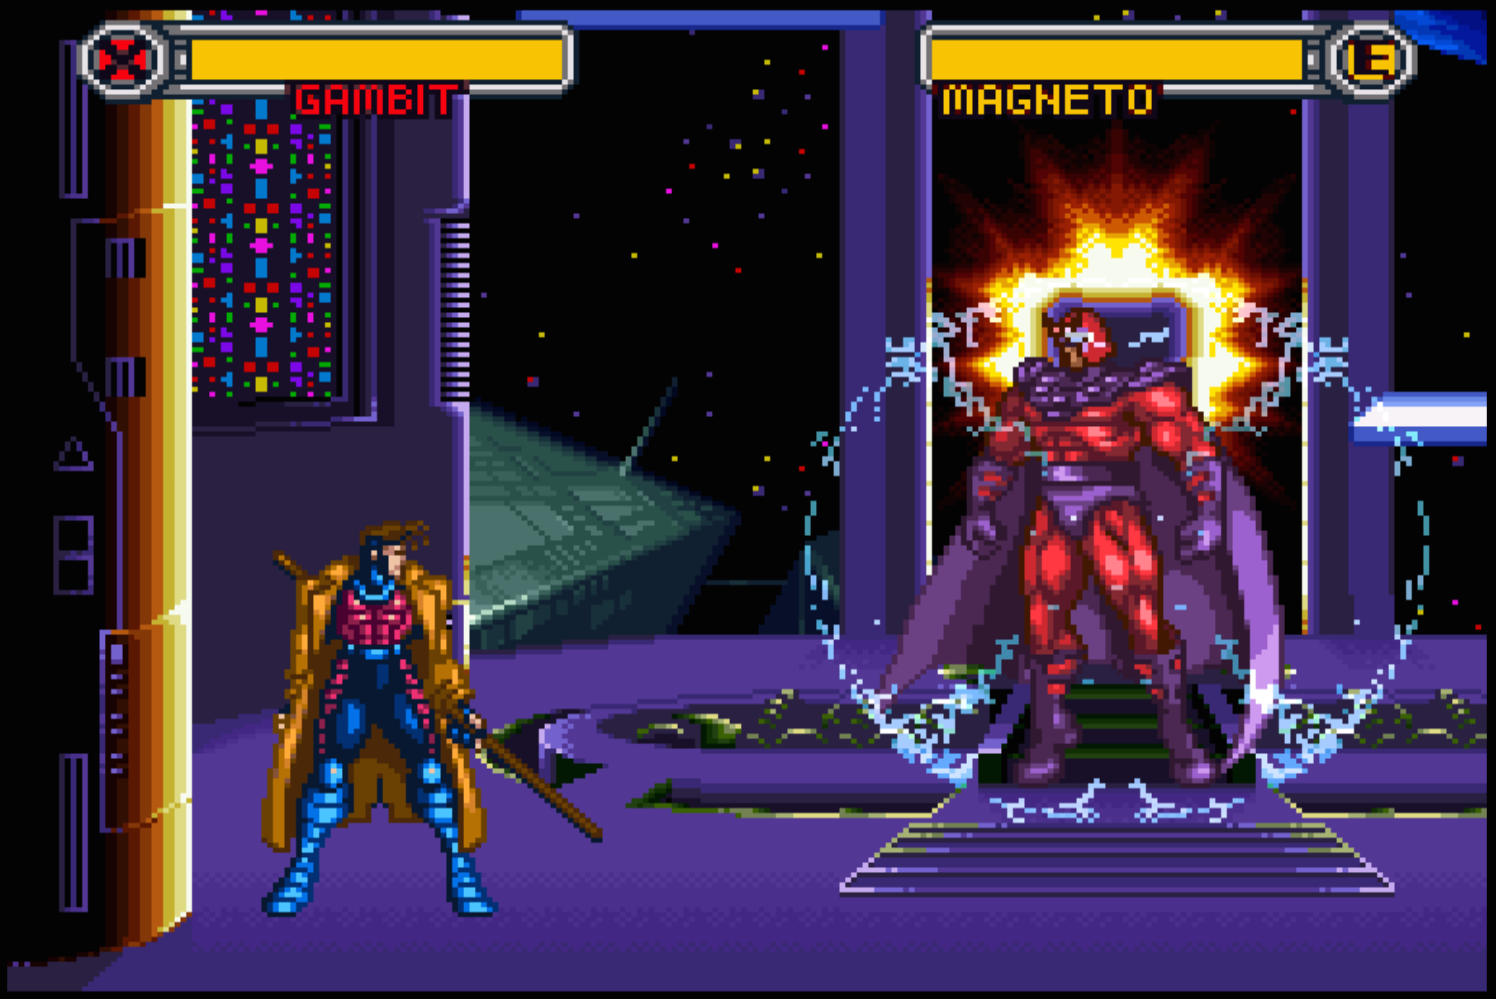 Gambit vs Magneto